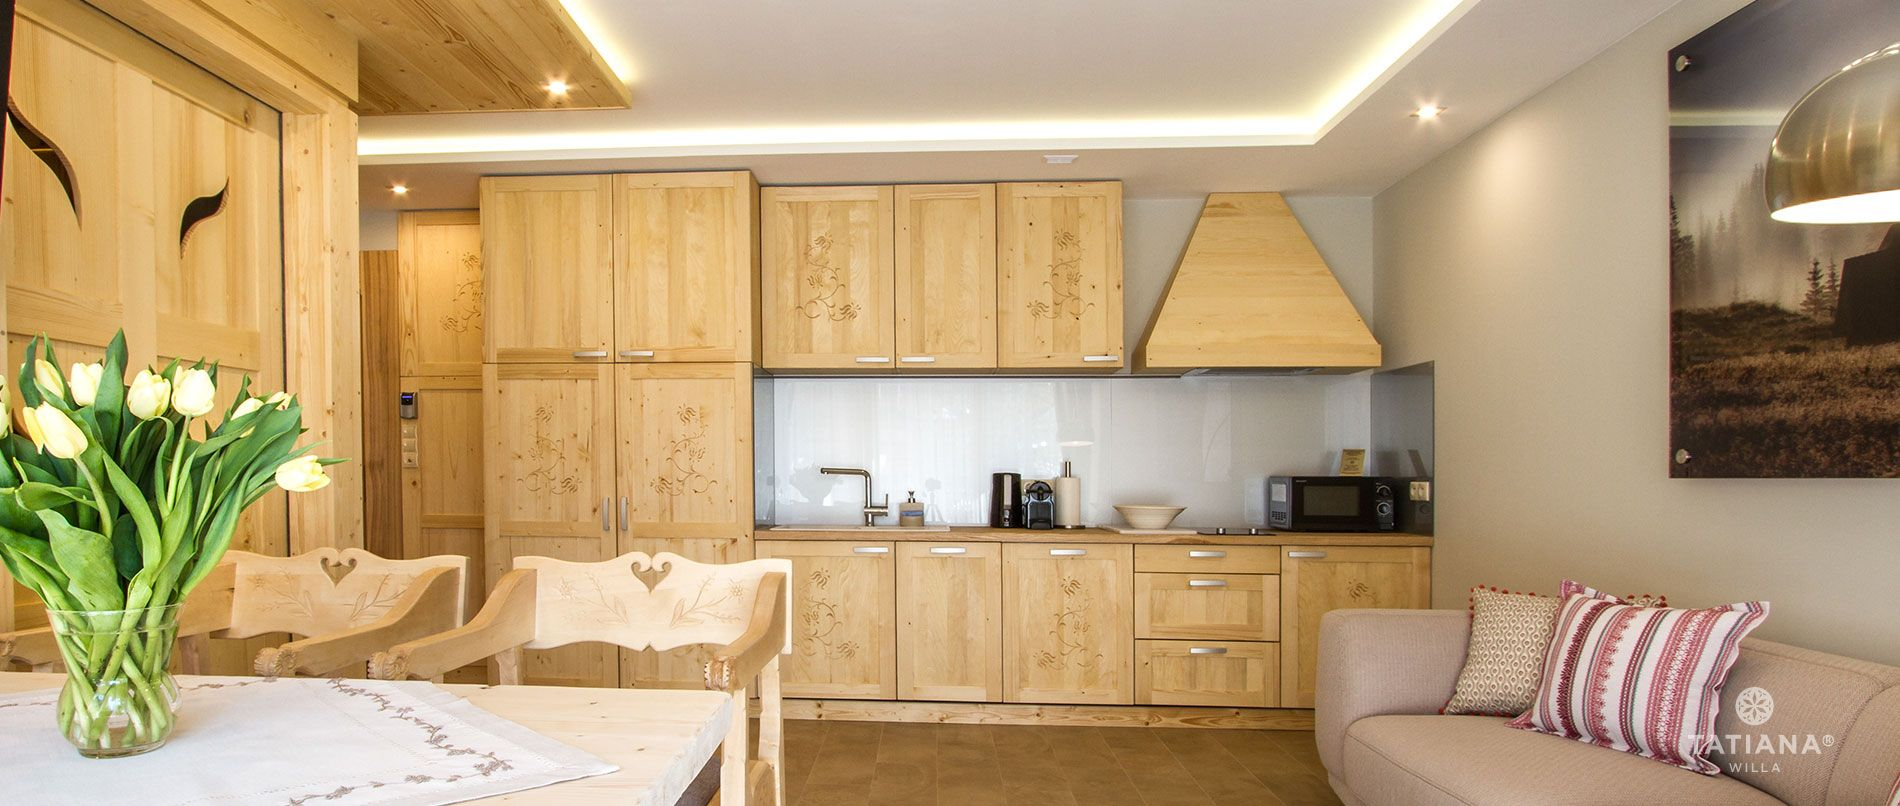 Pine Apartment - kitchenette